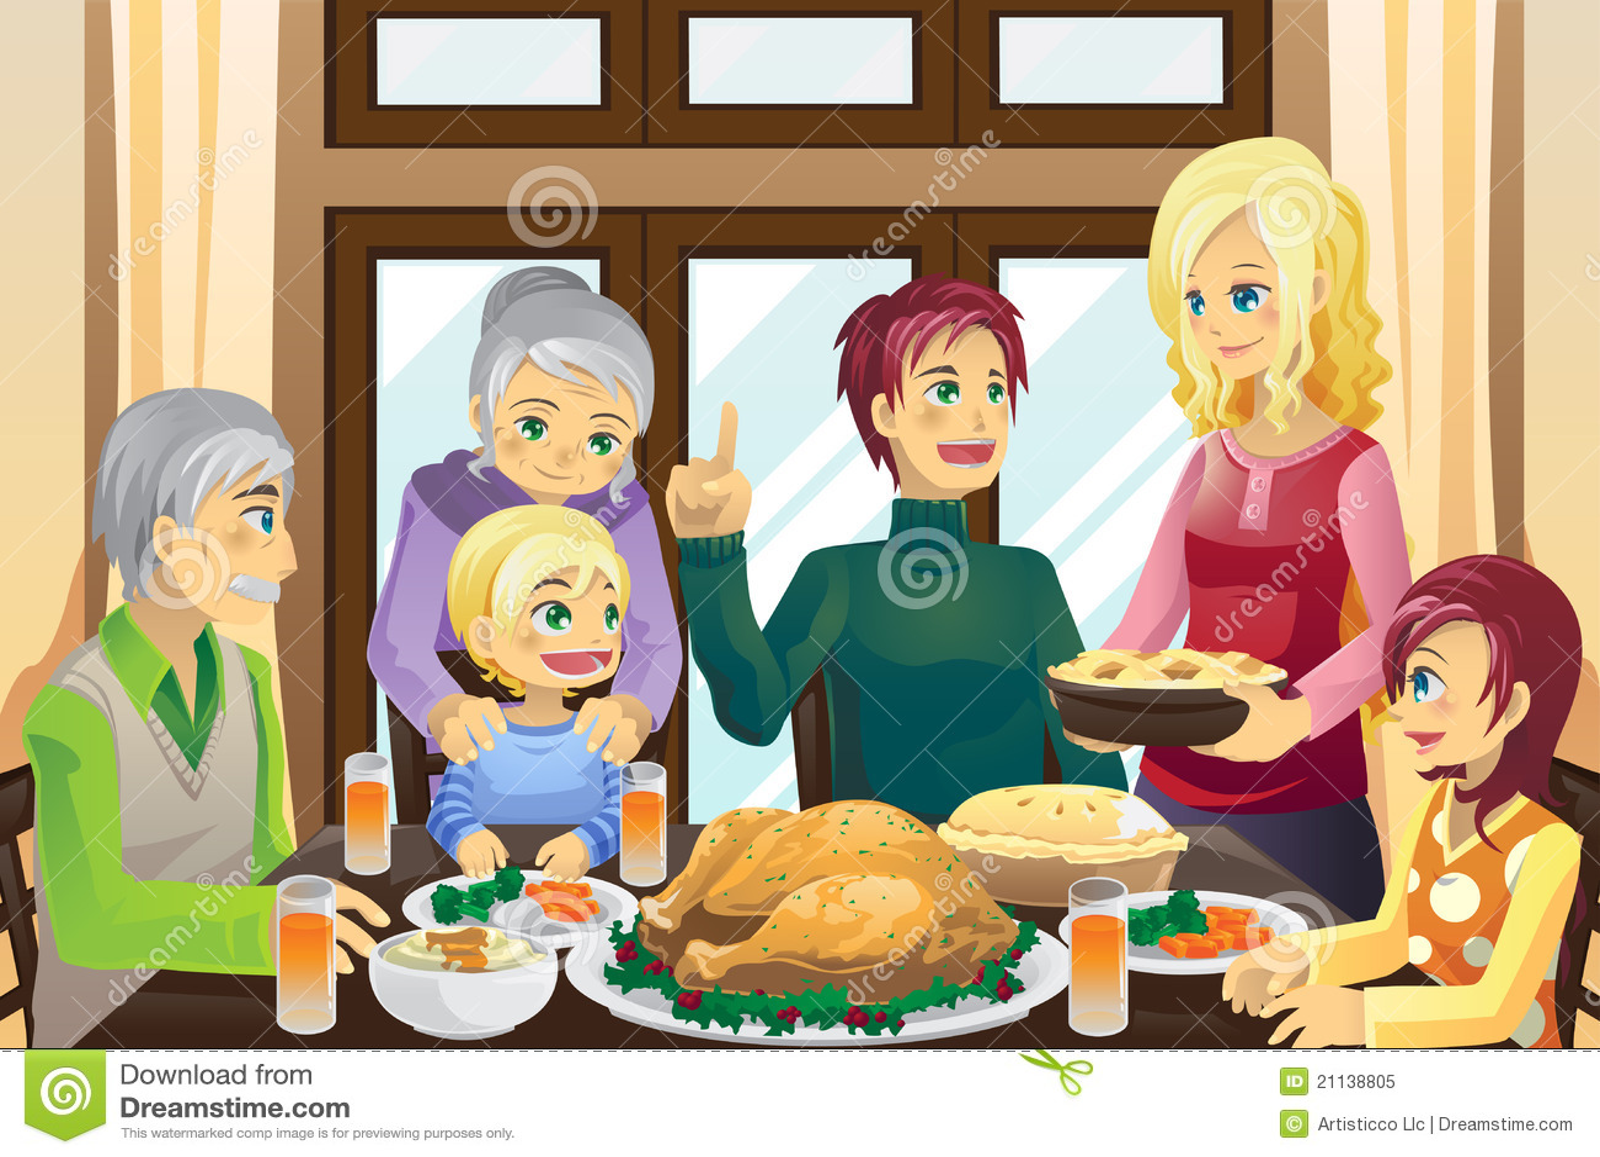 Thanksgiving Family Dinner Royalty Free Stock Photo  : thanksgiving family dinner 21138805 from www.dreamstime.com size 1300 x 957 jpeg 374kB